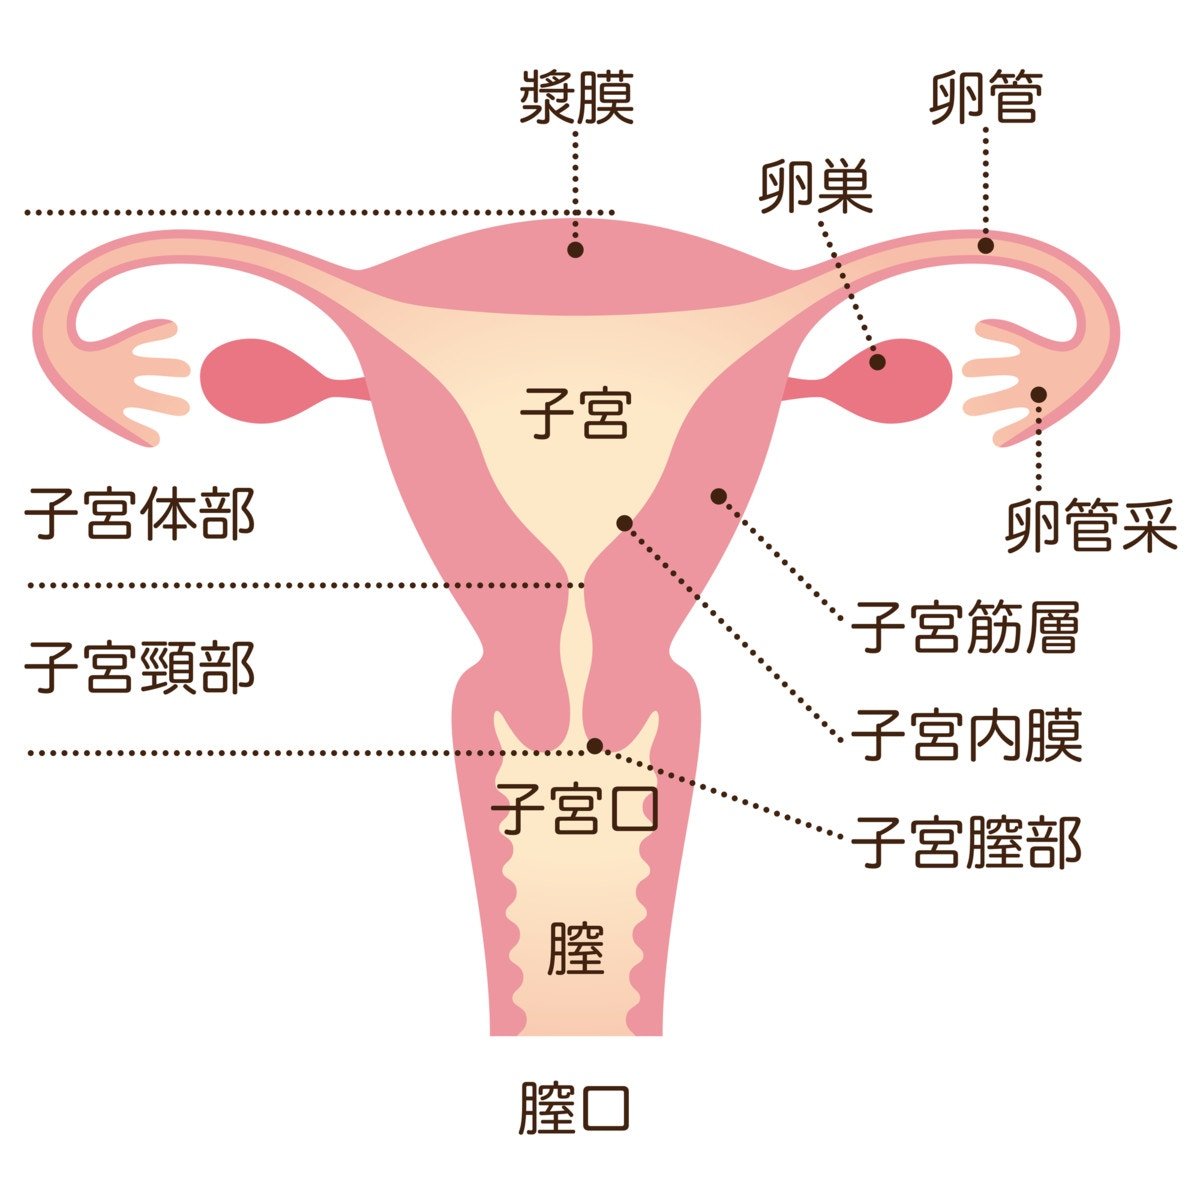 a さん 48 歳 女性 は 卵巣 癌